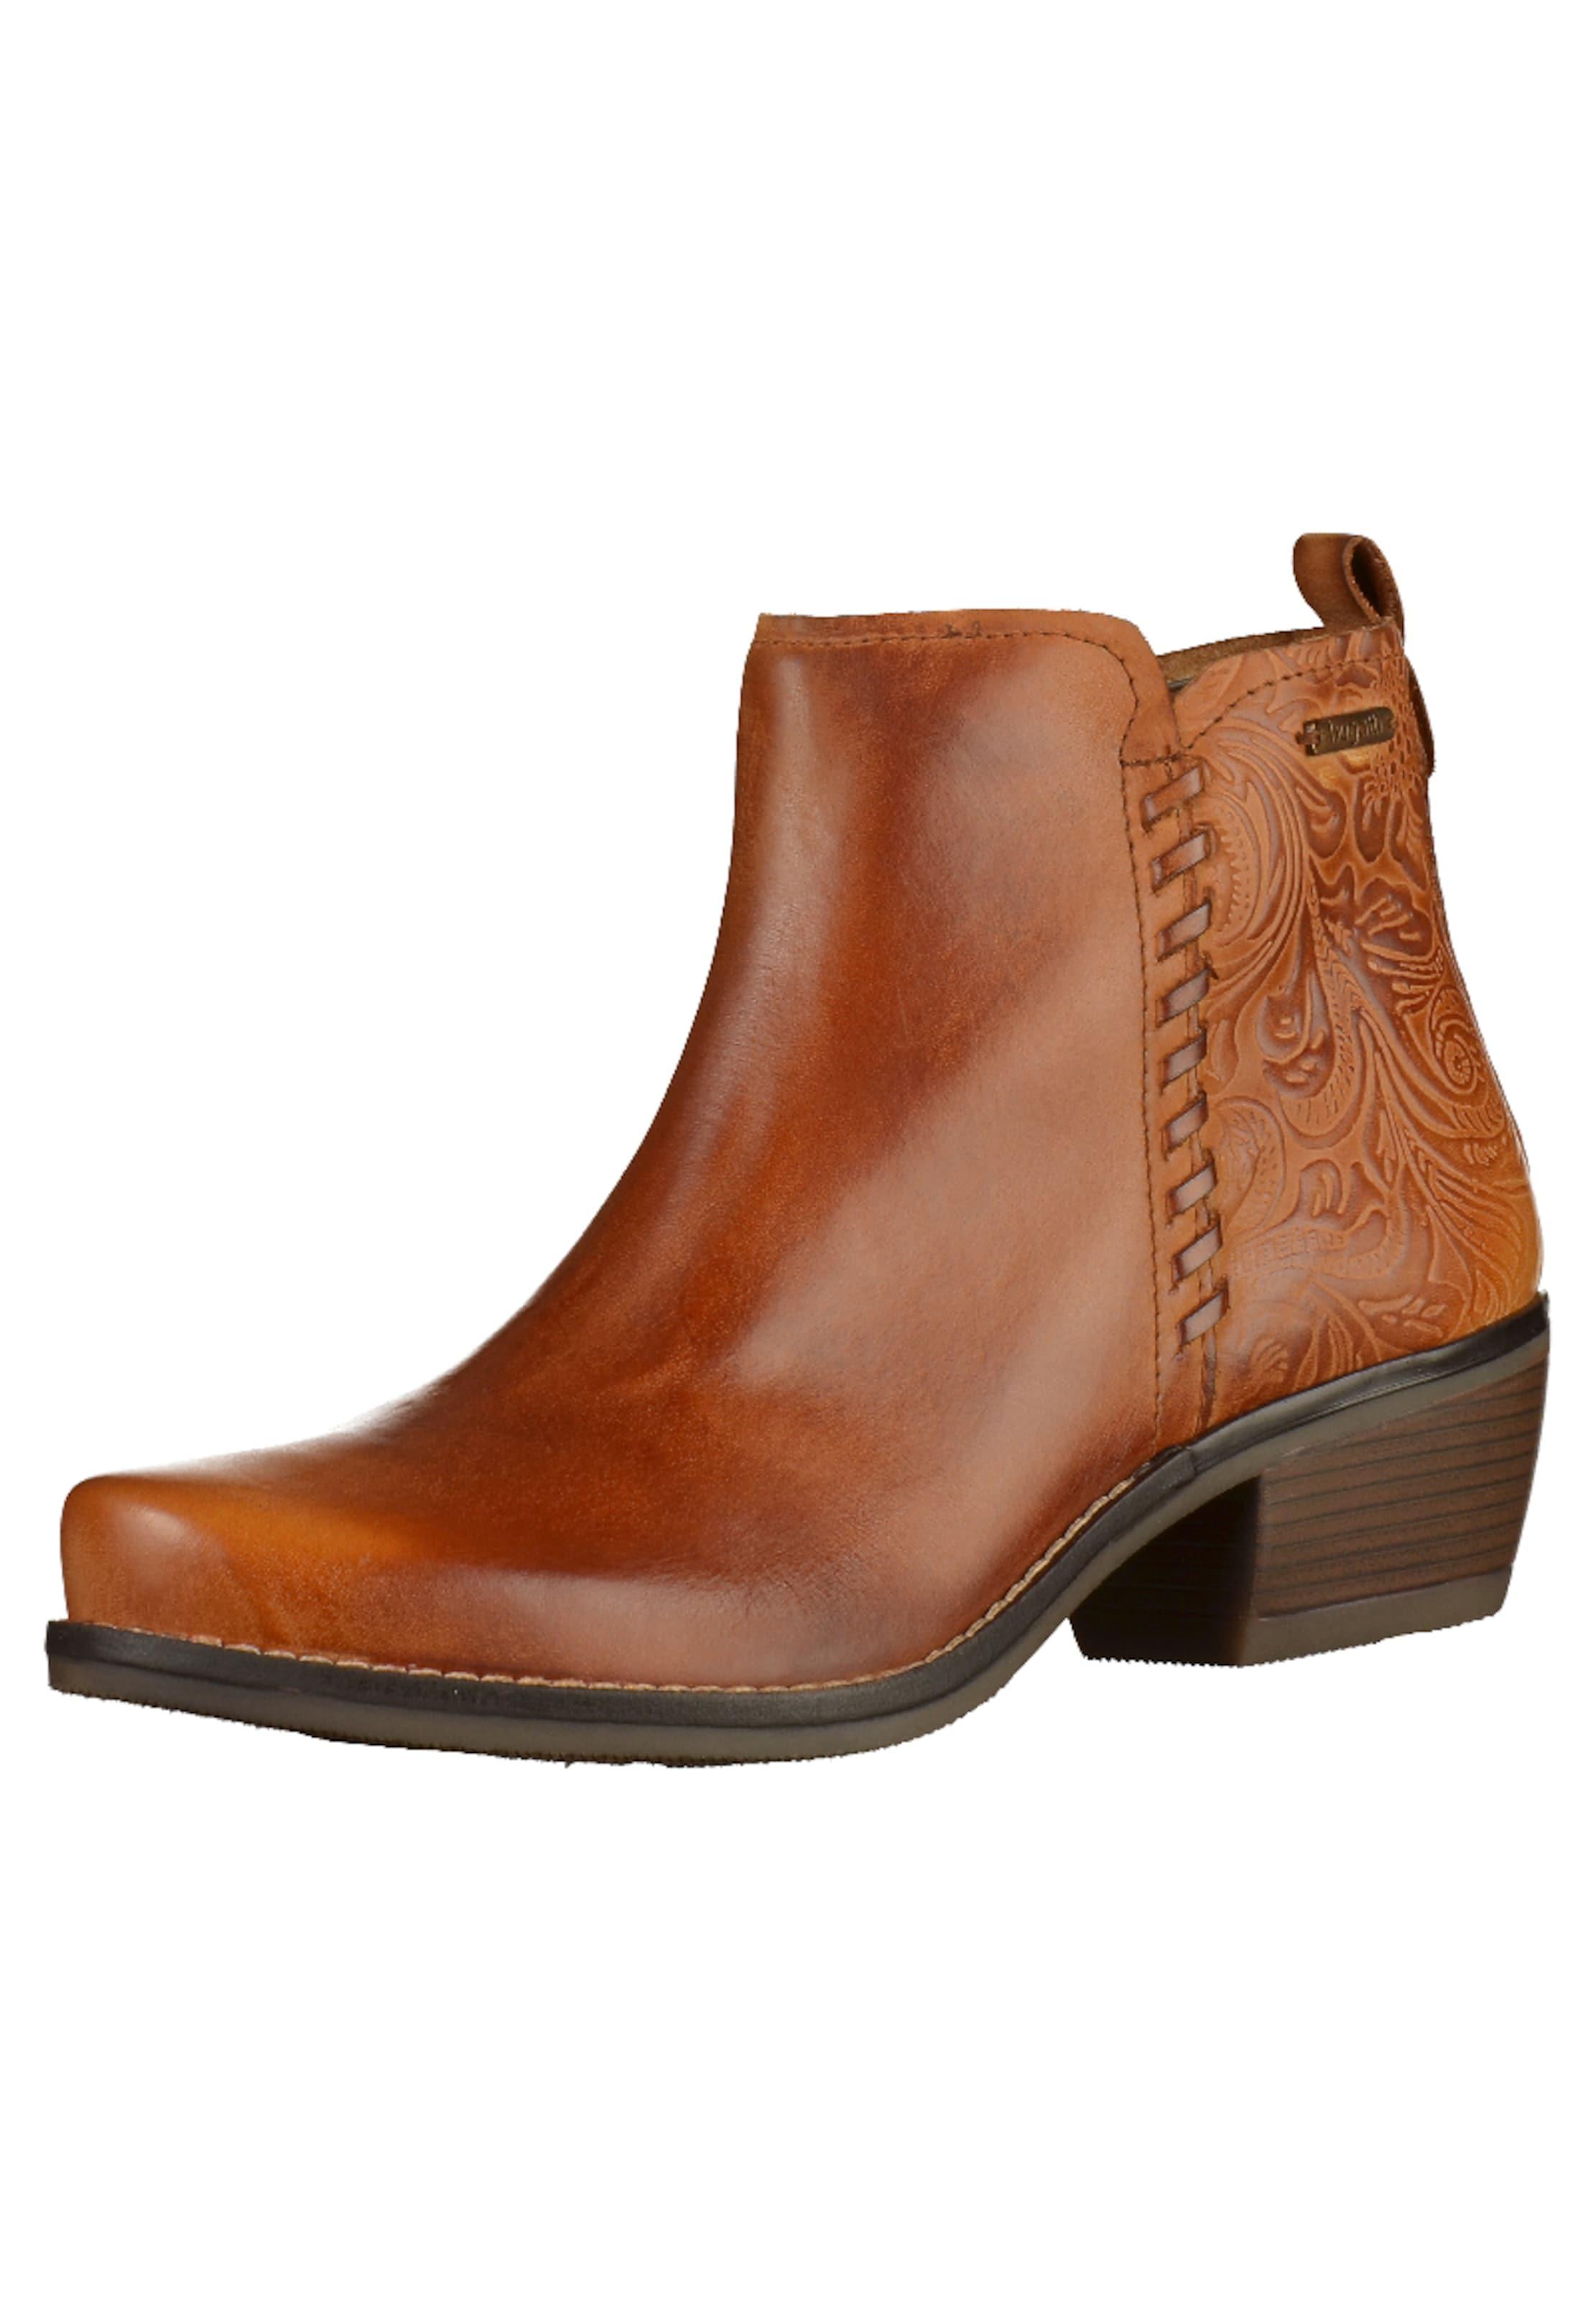 bugatti Ankle Boot Verschleißfeste Verschleißfeste Boot billige Schuhe 1e821e